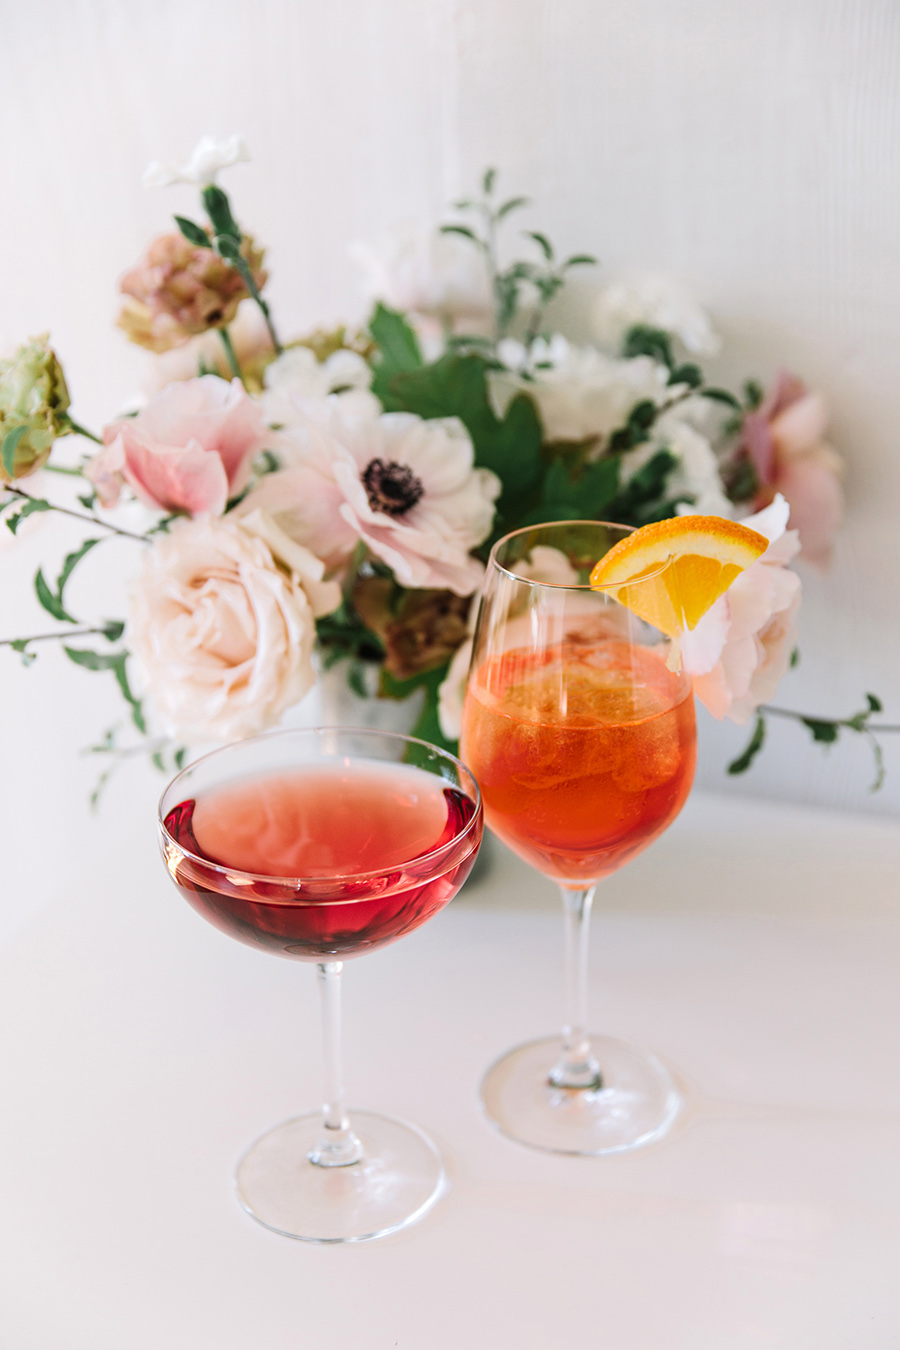 Aperol spritzes and sparking rosé cocktails